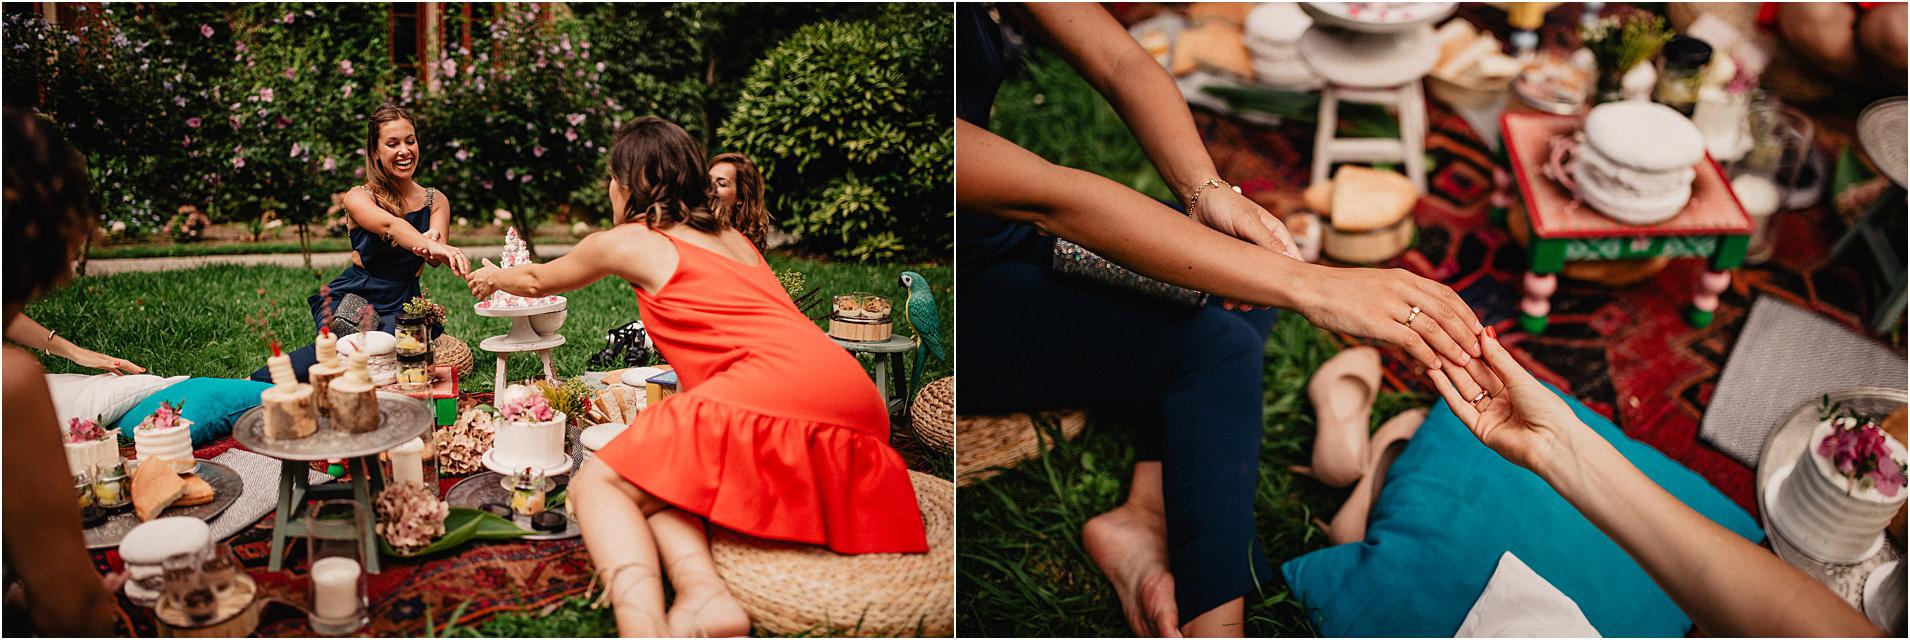 Fotografía y video en Palacio de Arbaisenea Bodas San Sebastián Donostia Guipuzcoa - Finca Arbaisenea by Maher Catering Wedding films and photography-8.jpg